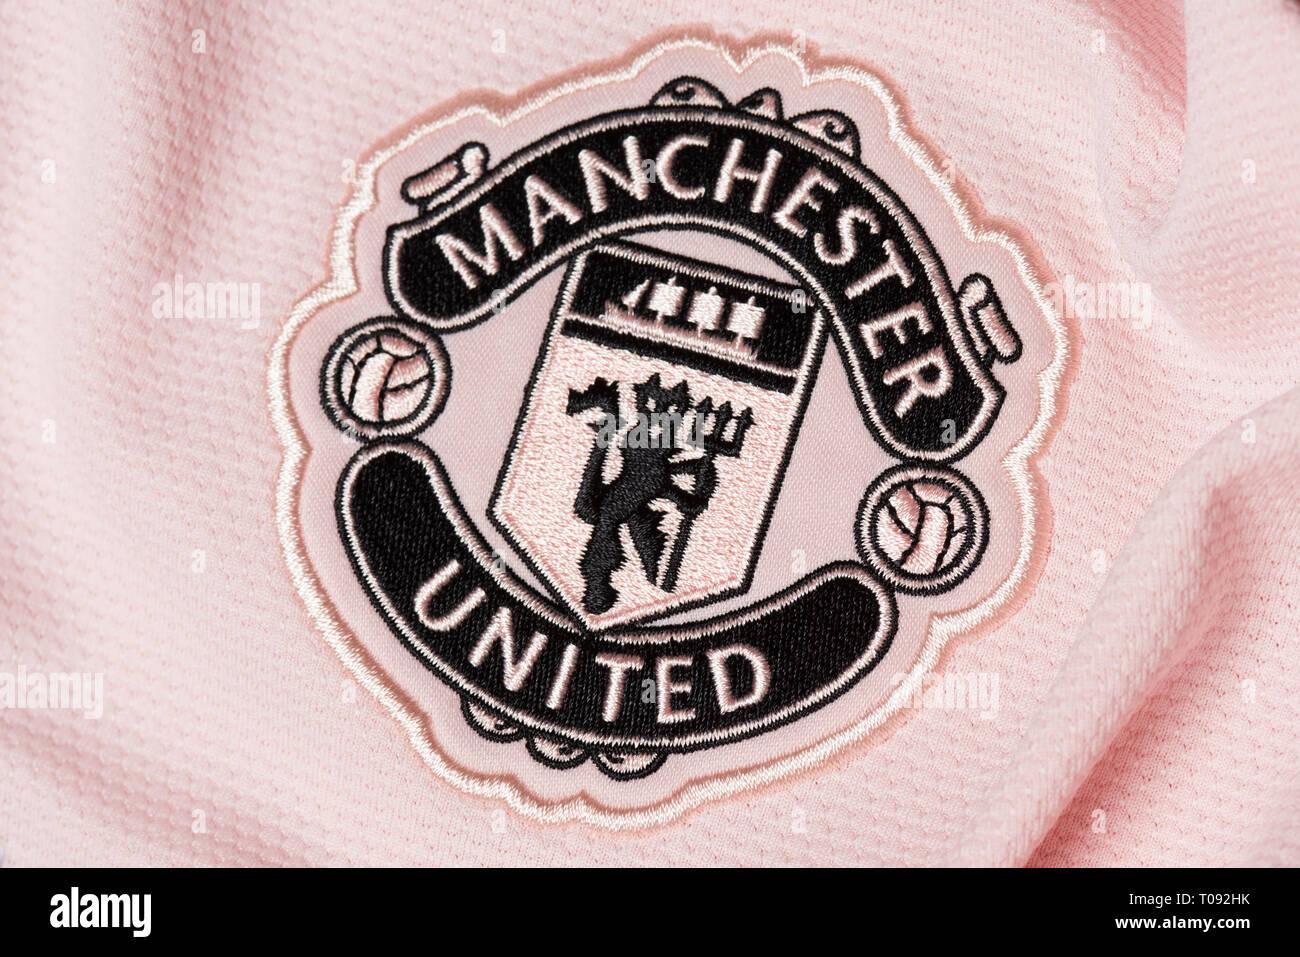 online store b1d5c 78bea Manchester United Pink Away Jersey Stock Photos & Manchester ...